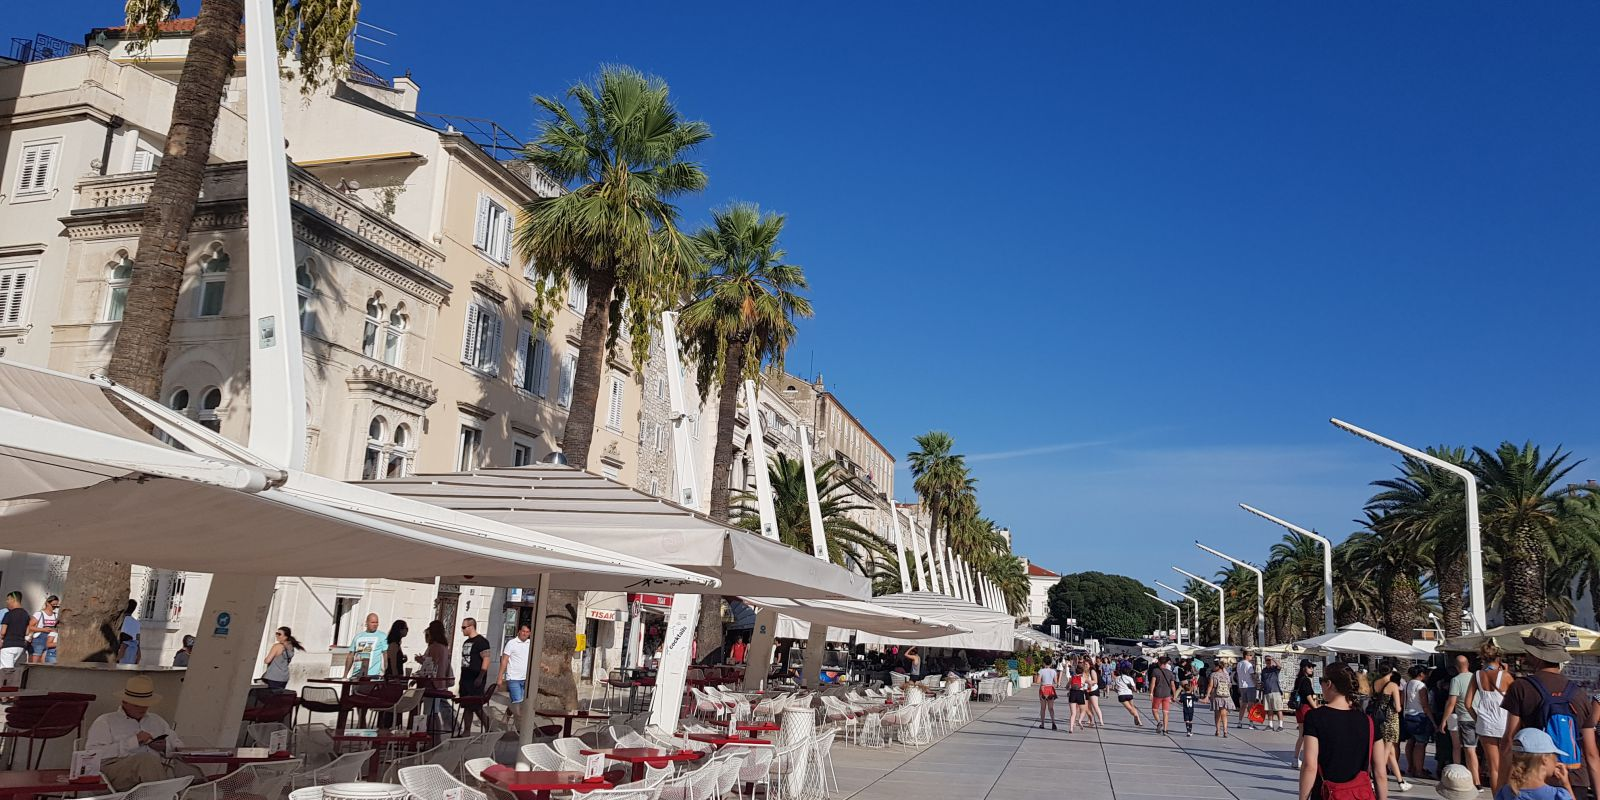 Riva, promenade of Split, Croatia, photo by Croatian Attractions